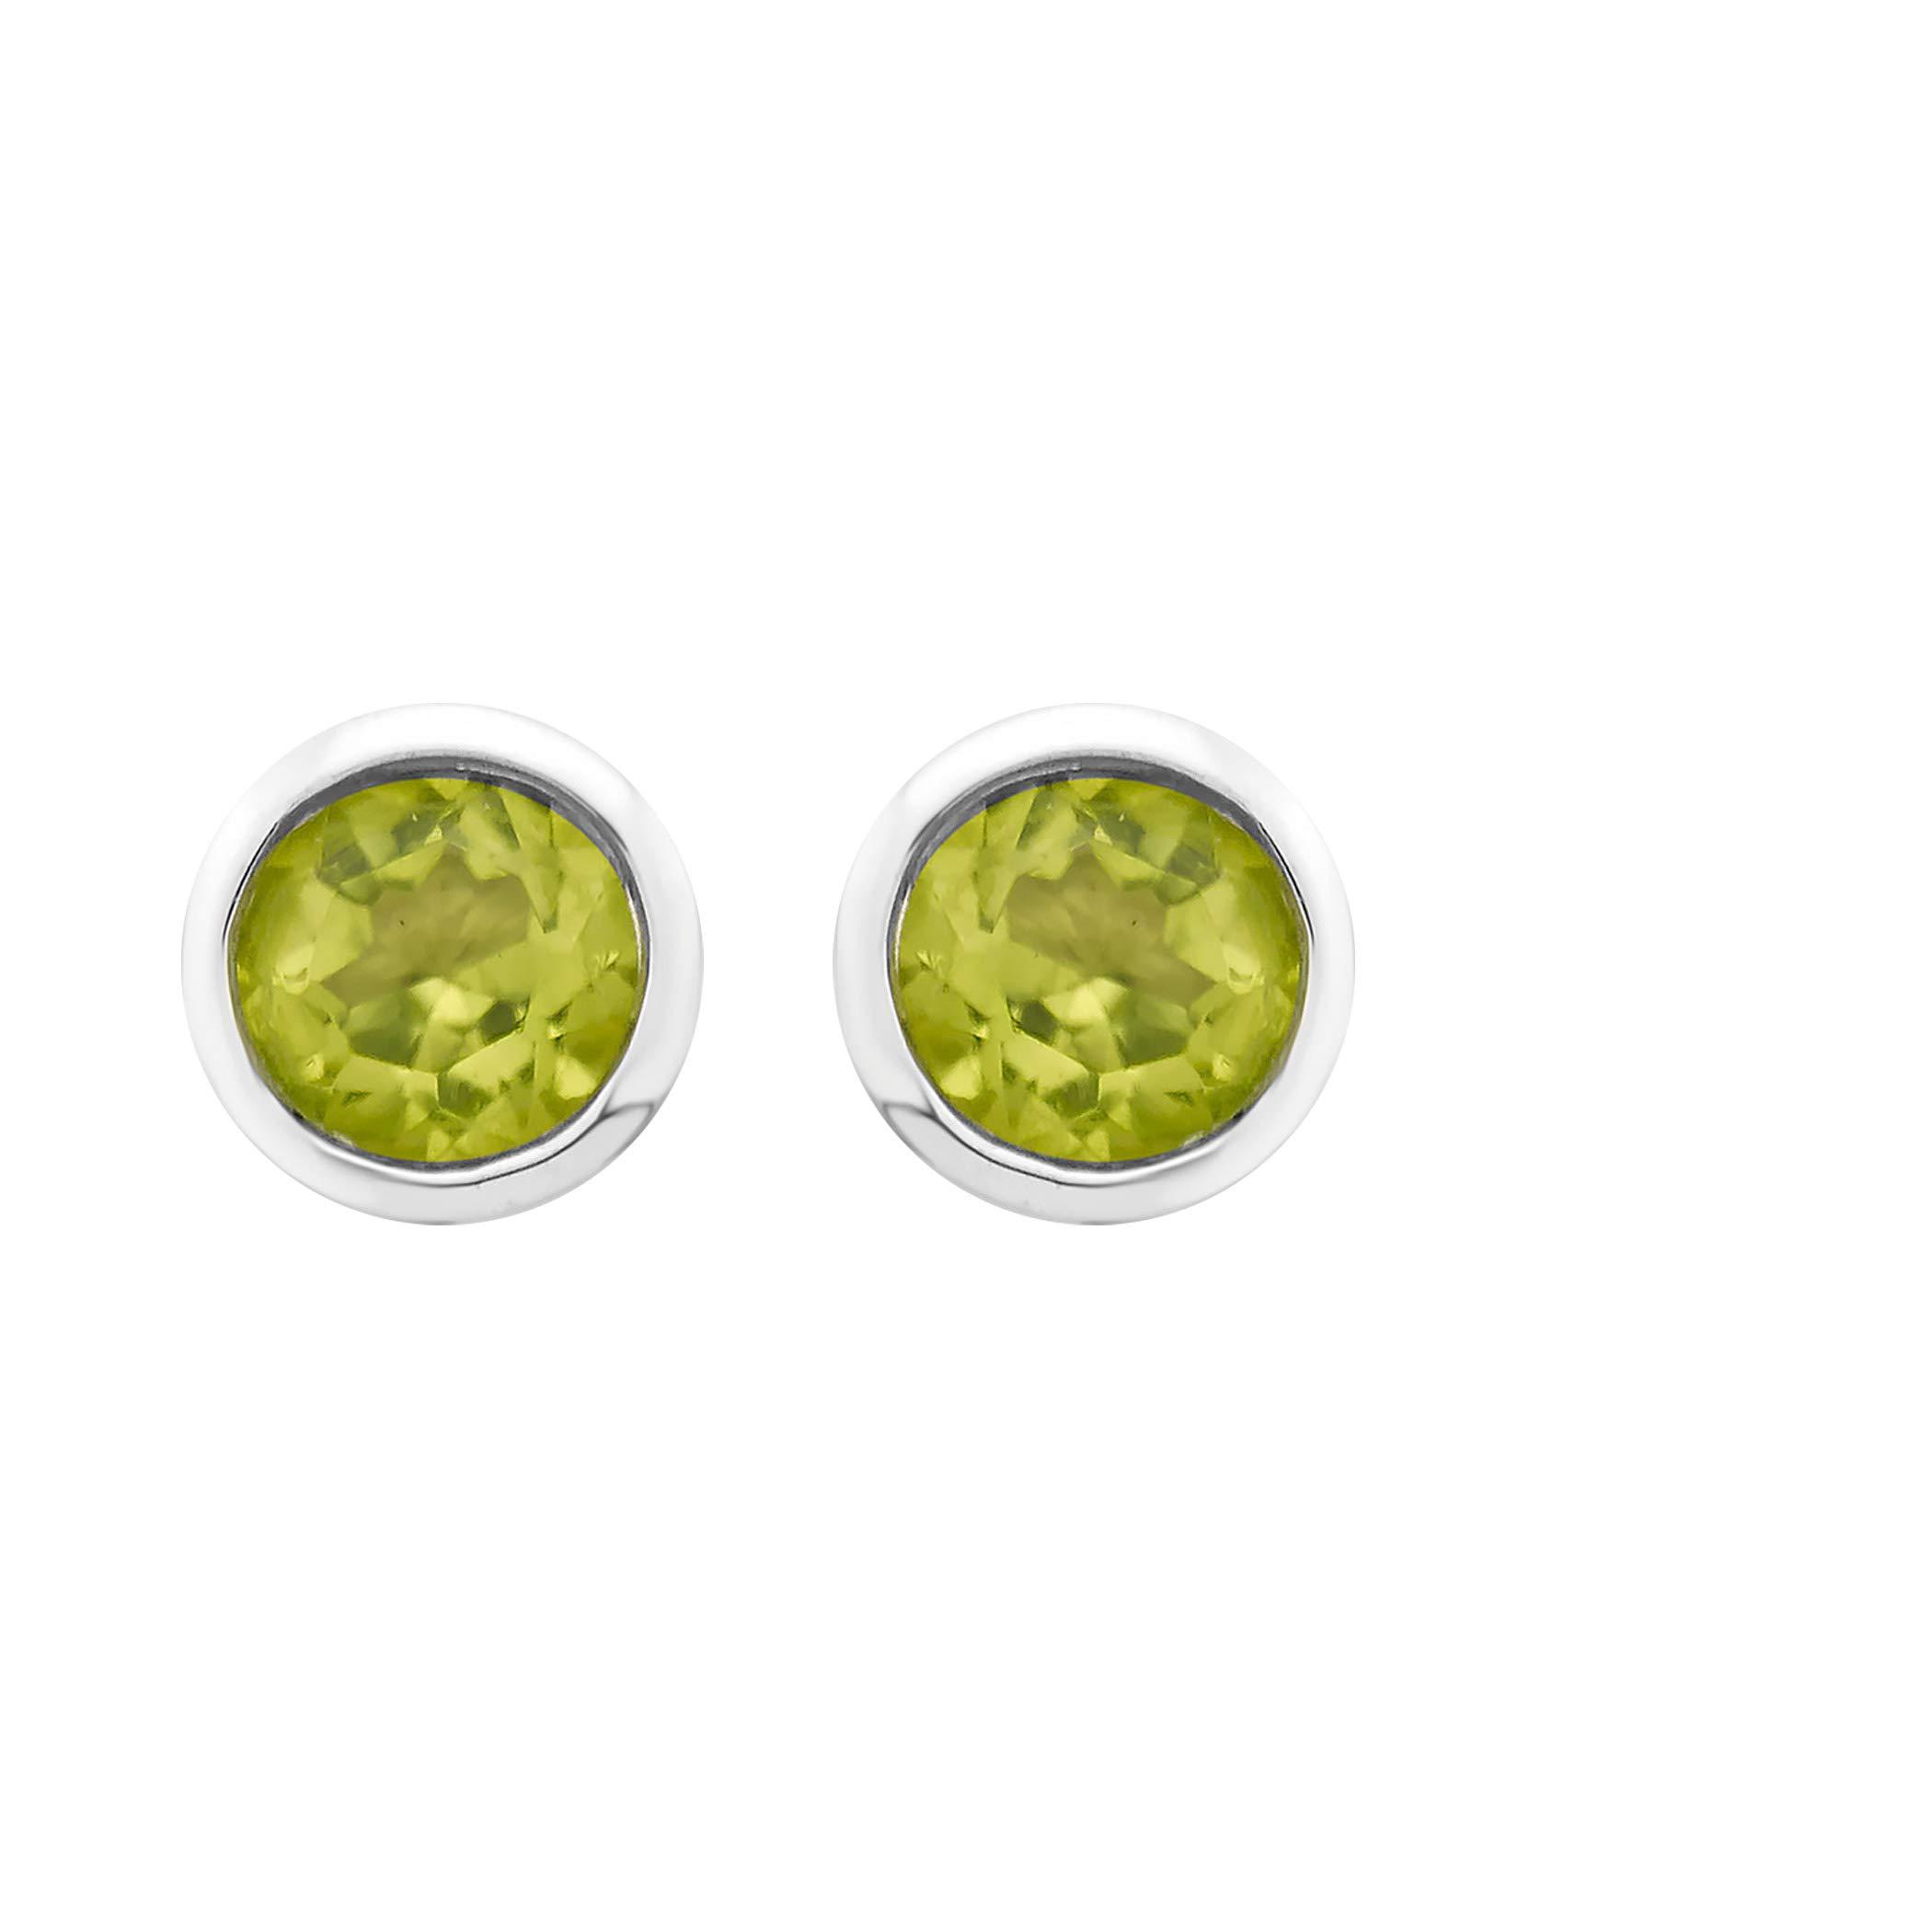 .925 Sterling Silver Peridot Gemstone Petite 4mm Bezel Cup Set Stud Earrings - August Birthstone